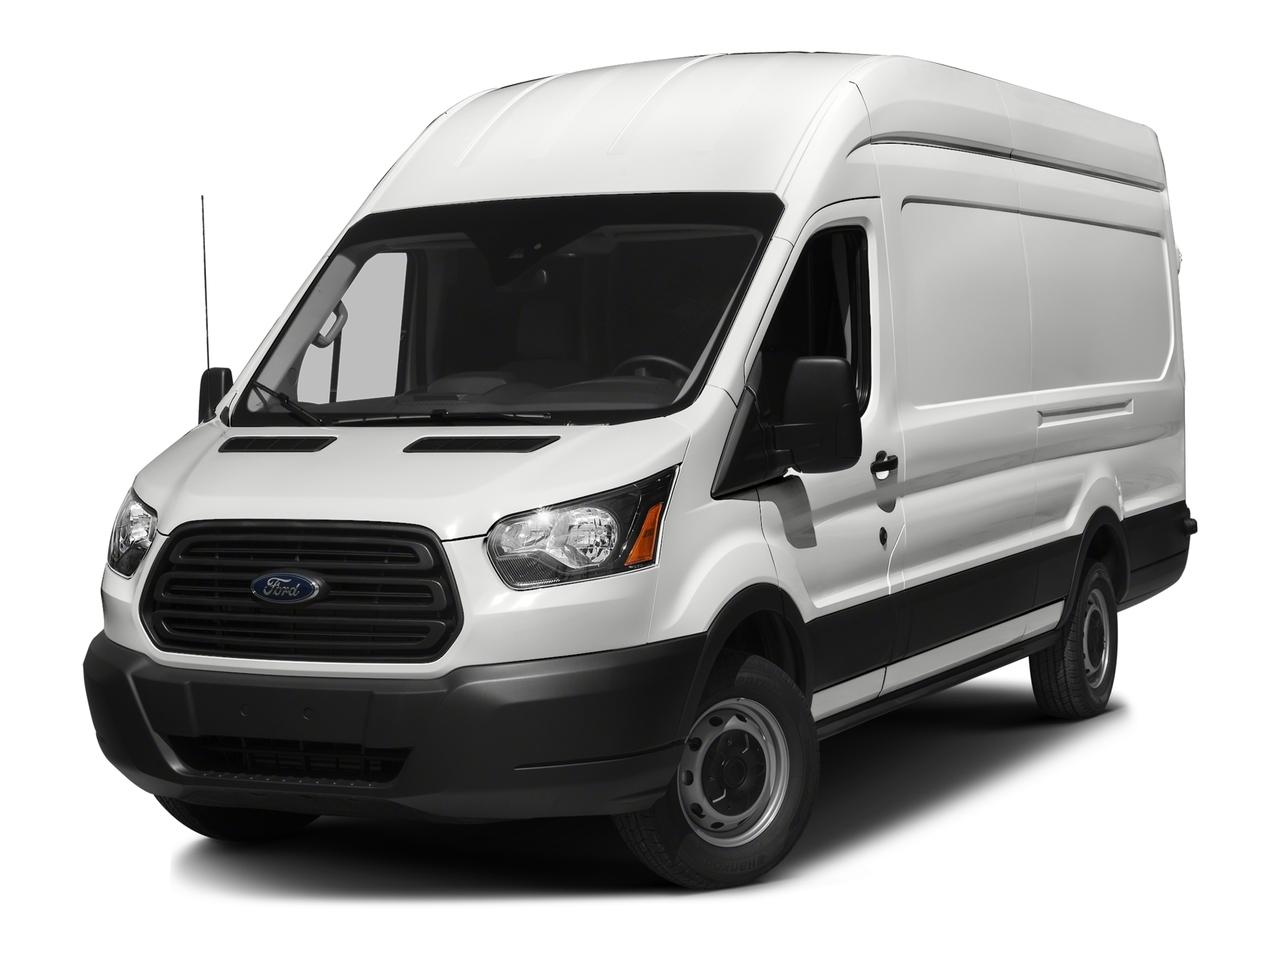 2016 Ford Transit Cargo Van Vehicle Photo in Denver, CO 80123